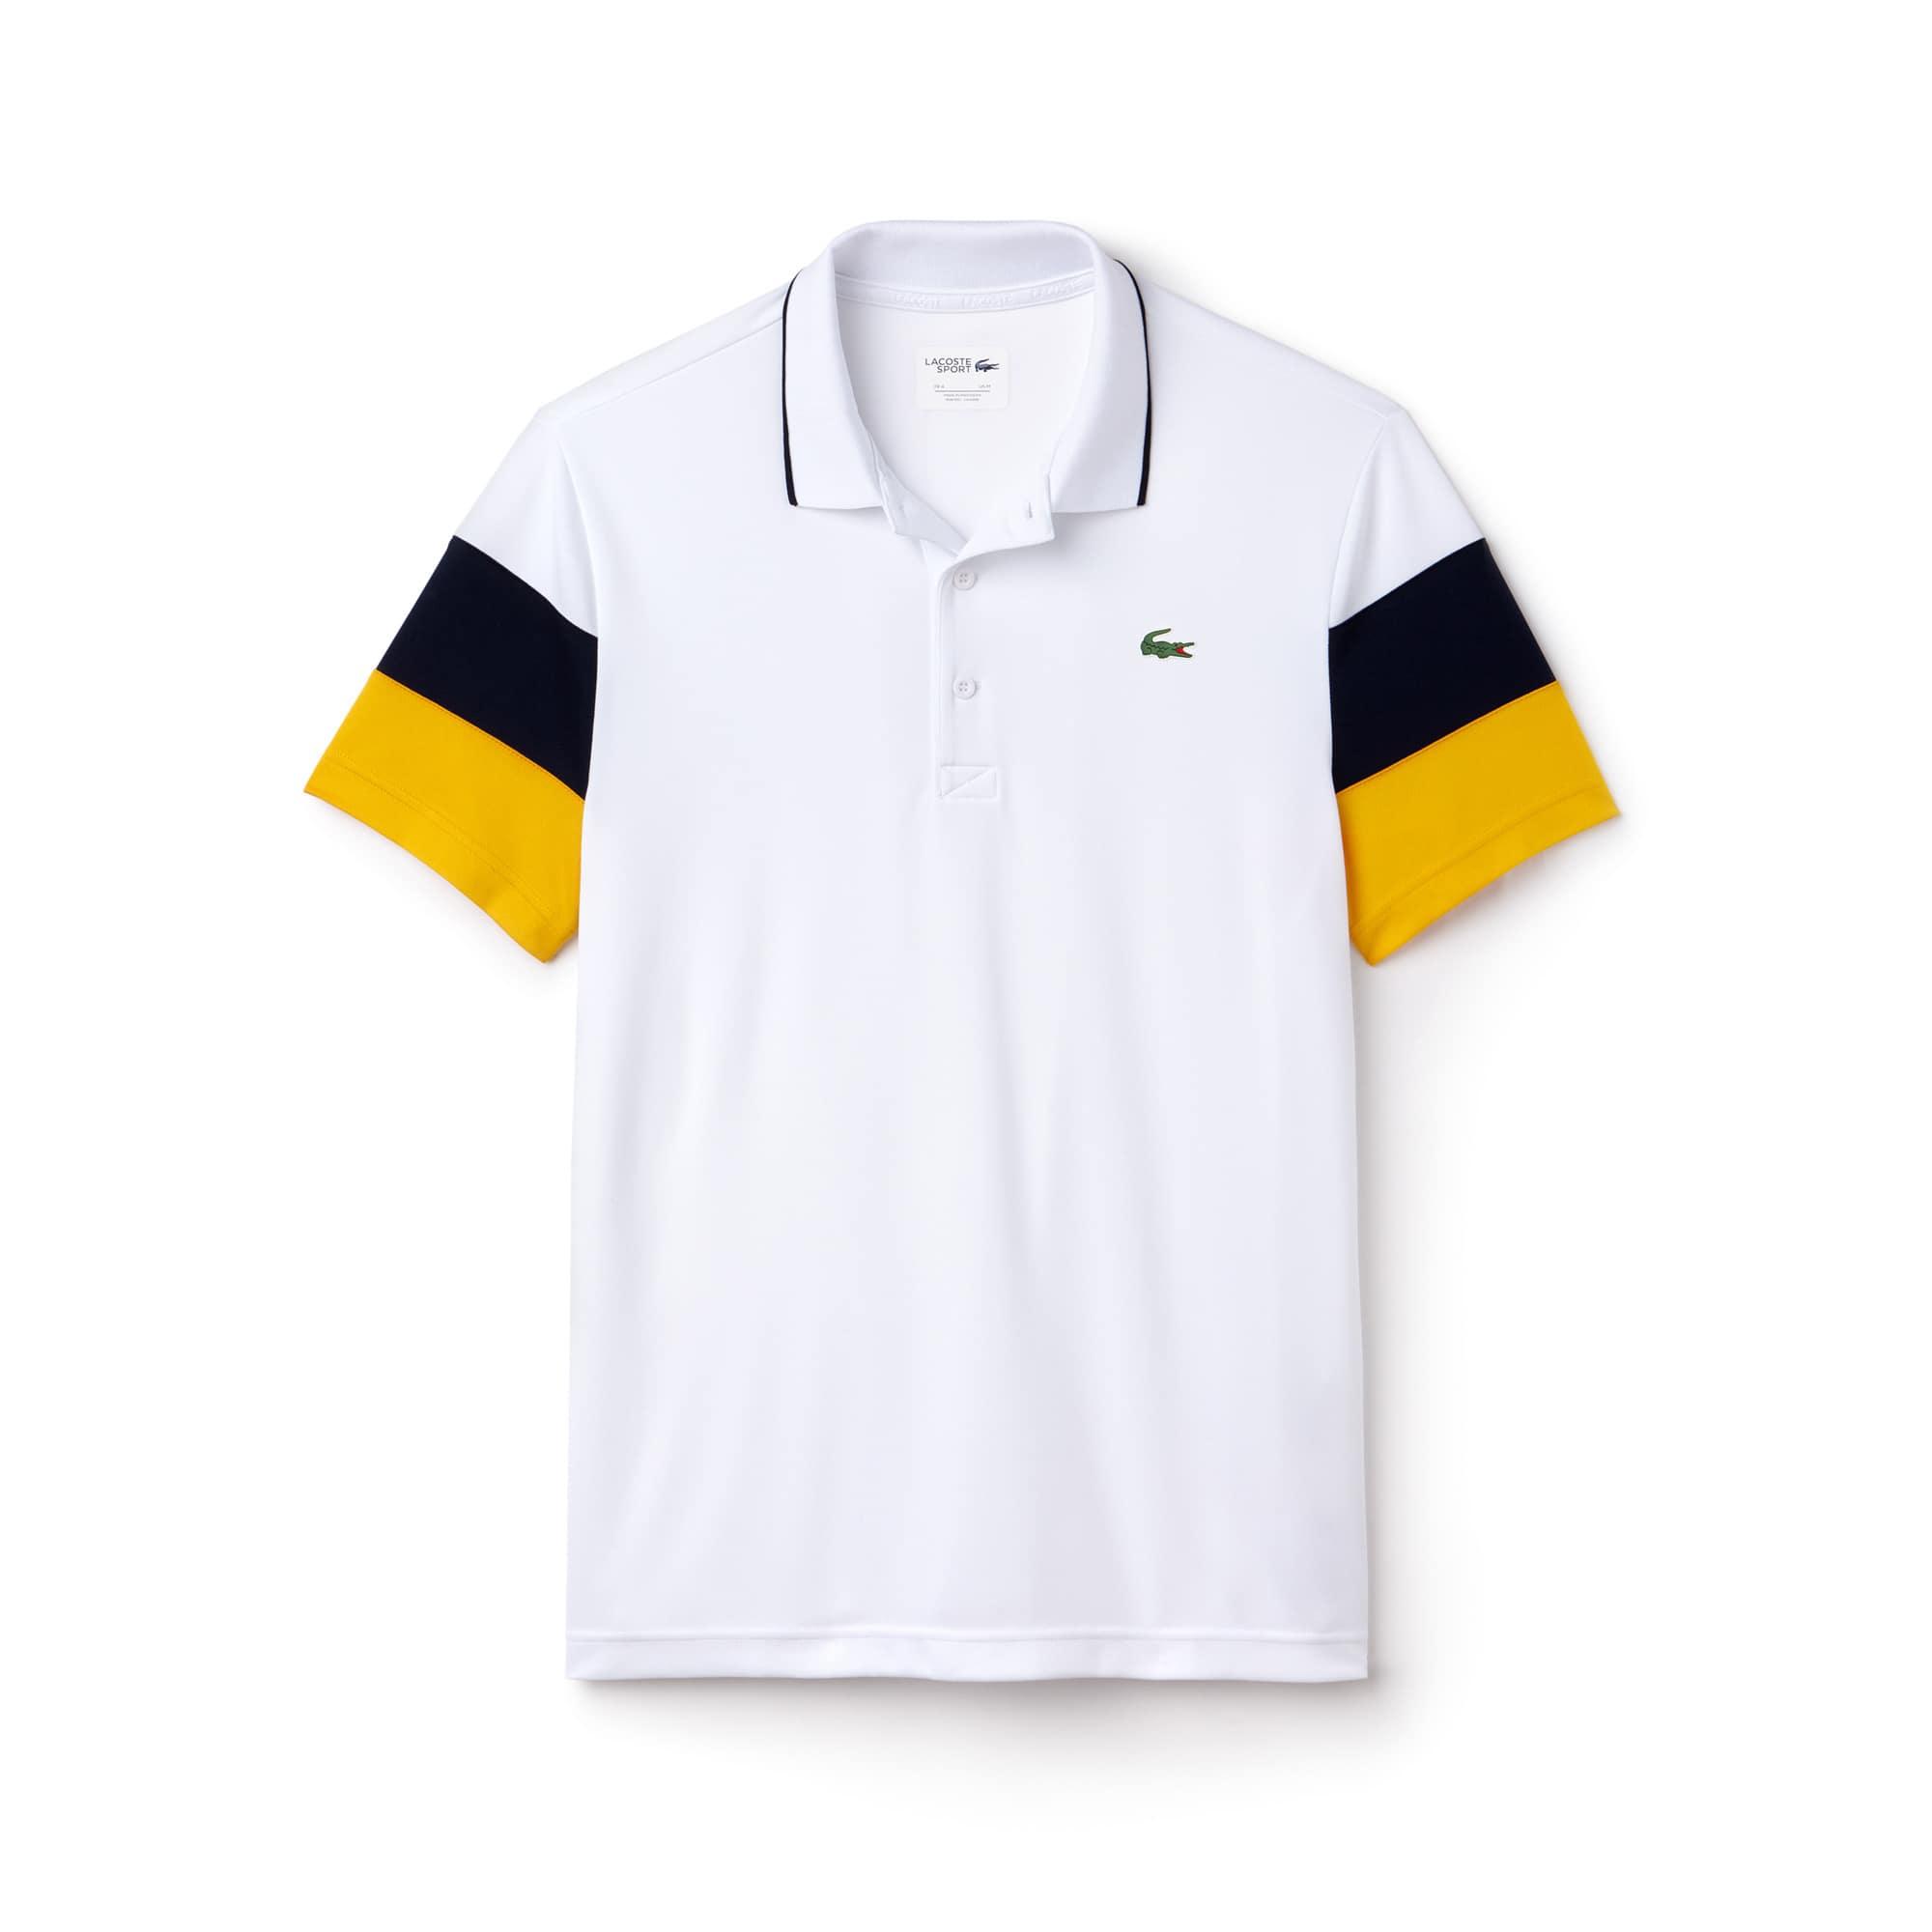 Men's Lacoste SPORT Colorblock Sleeves Technical Piqué Polo